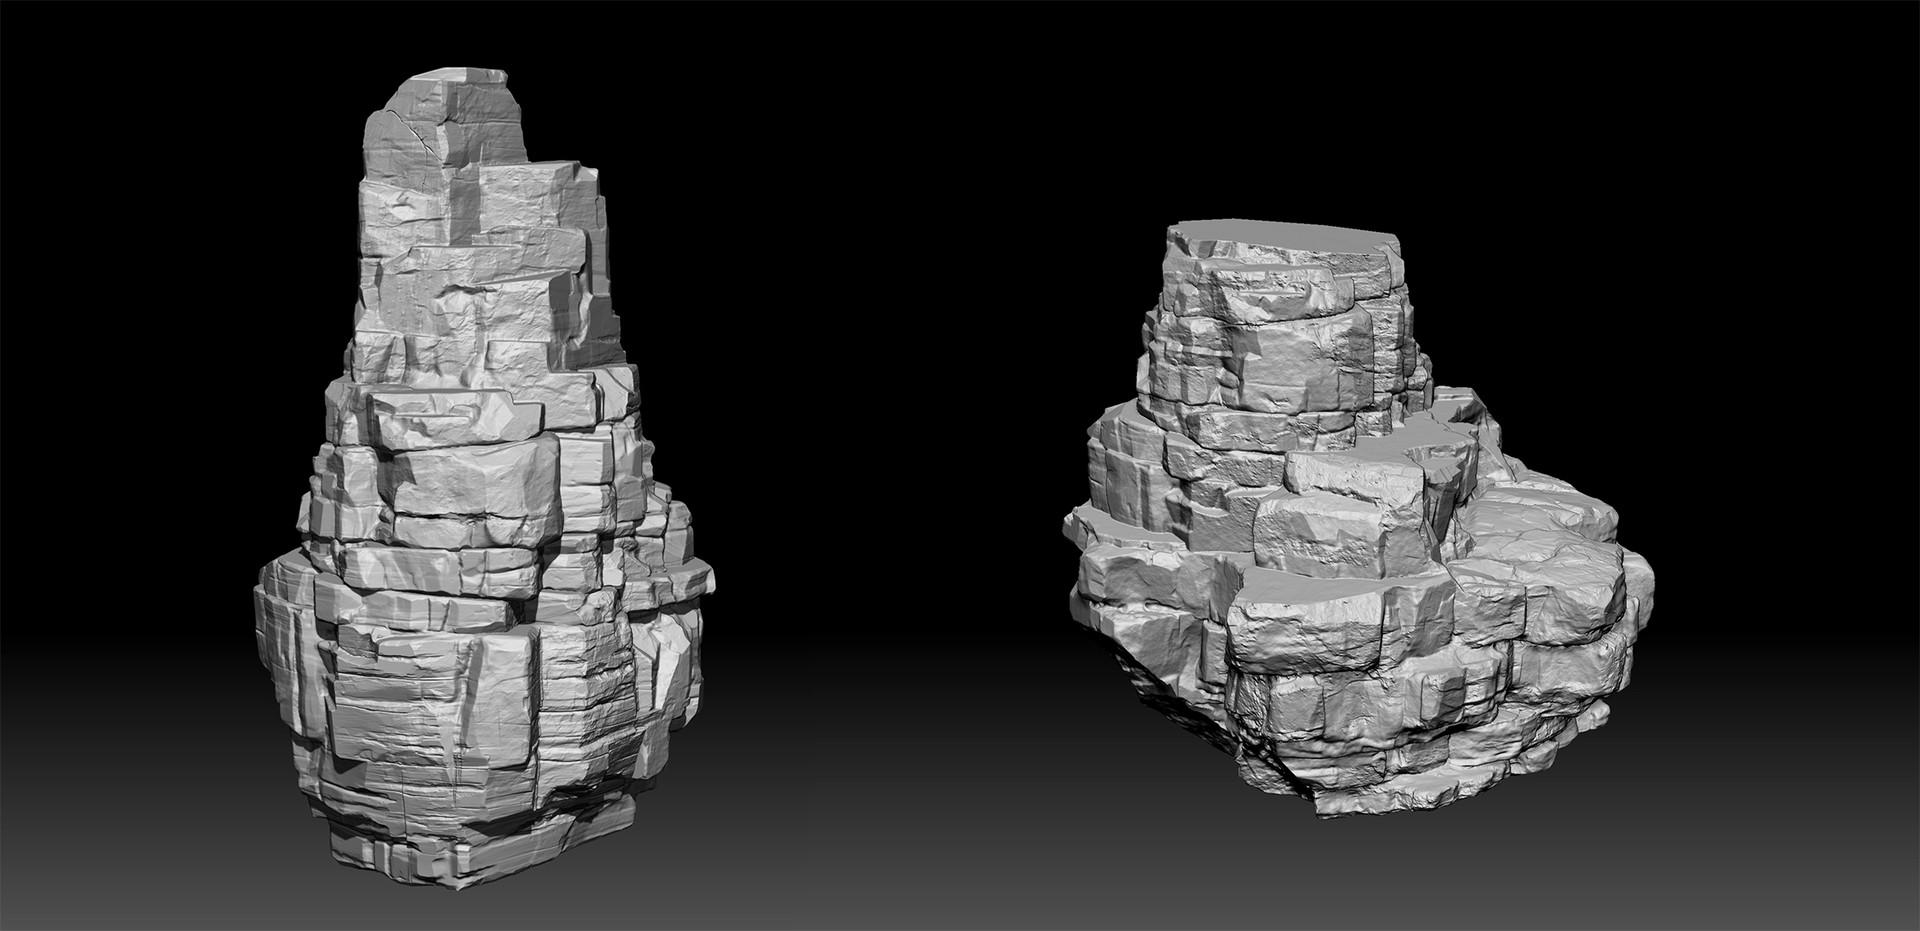 Walid k perrussel rock sculpt 2